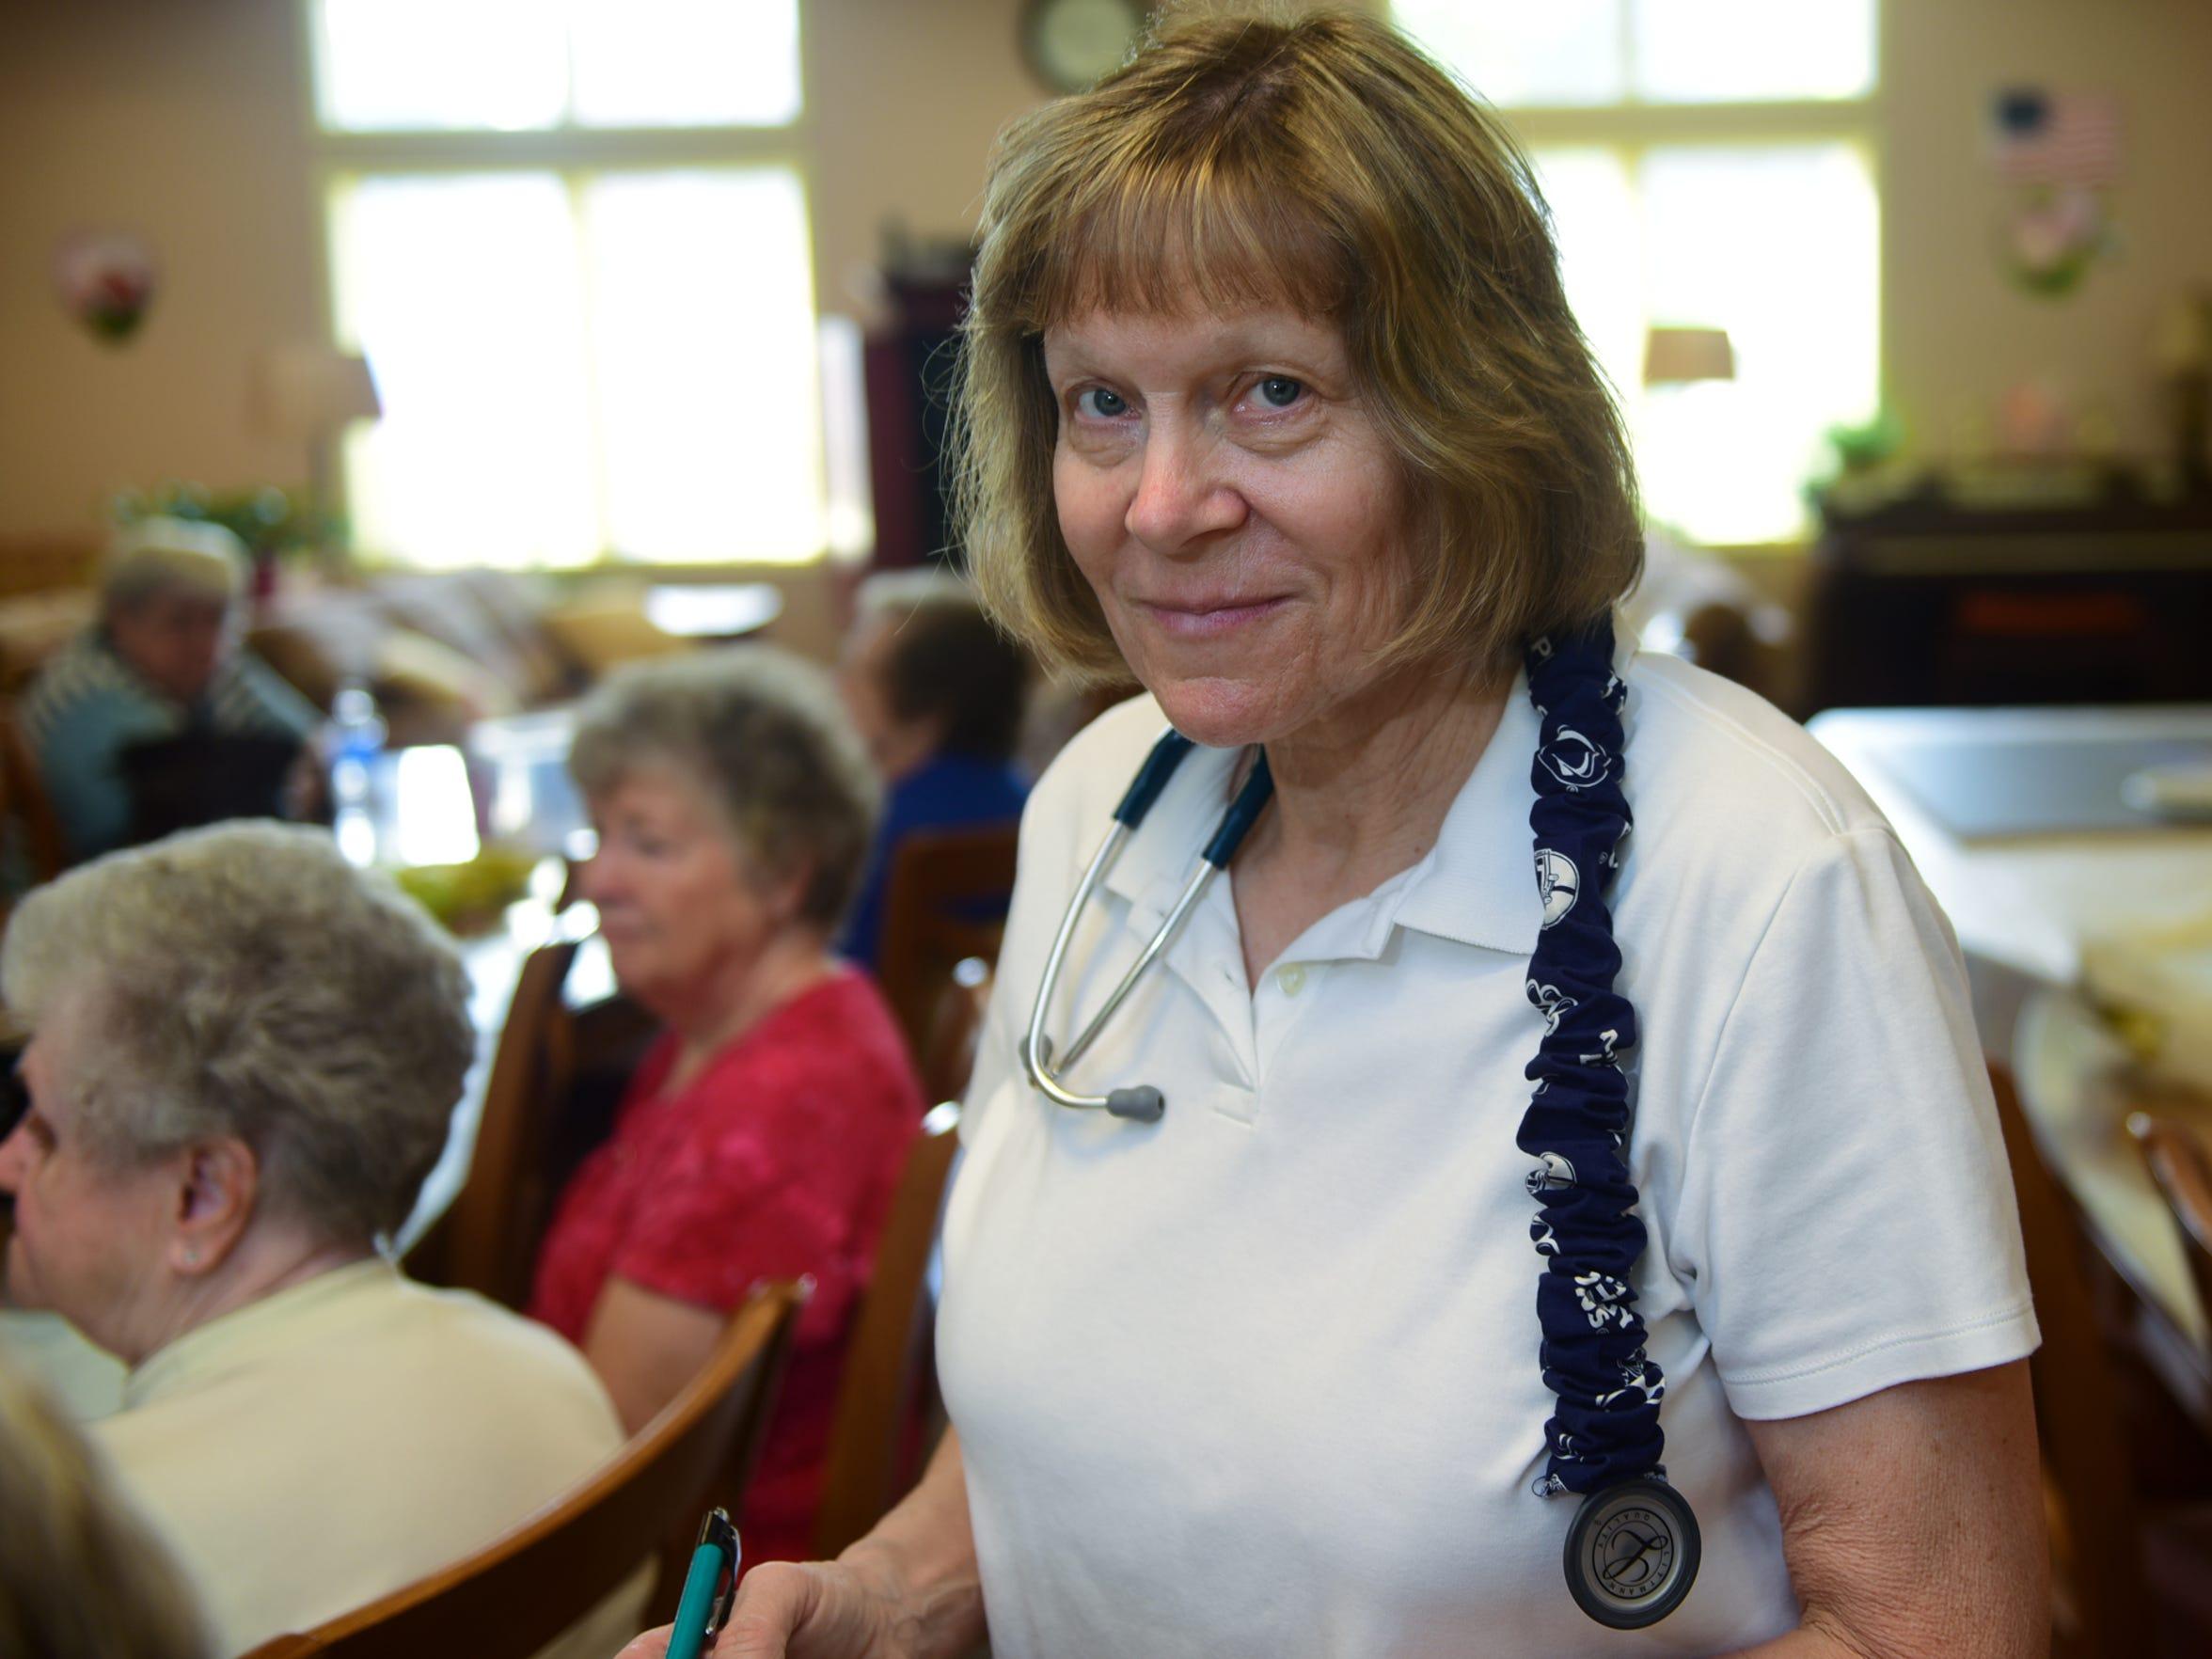 Community nurse Dee Parson visits residents at Episcopal